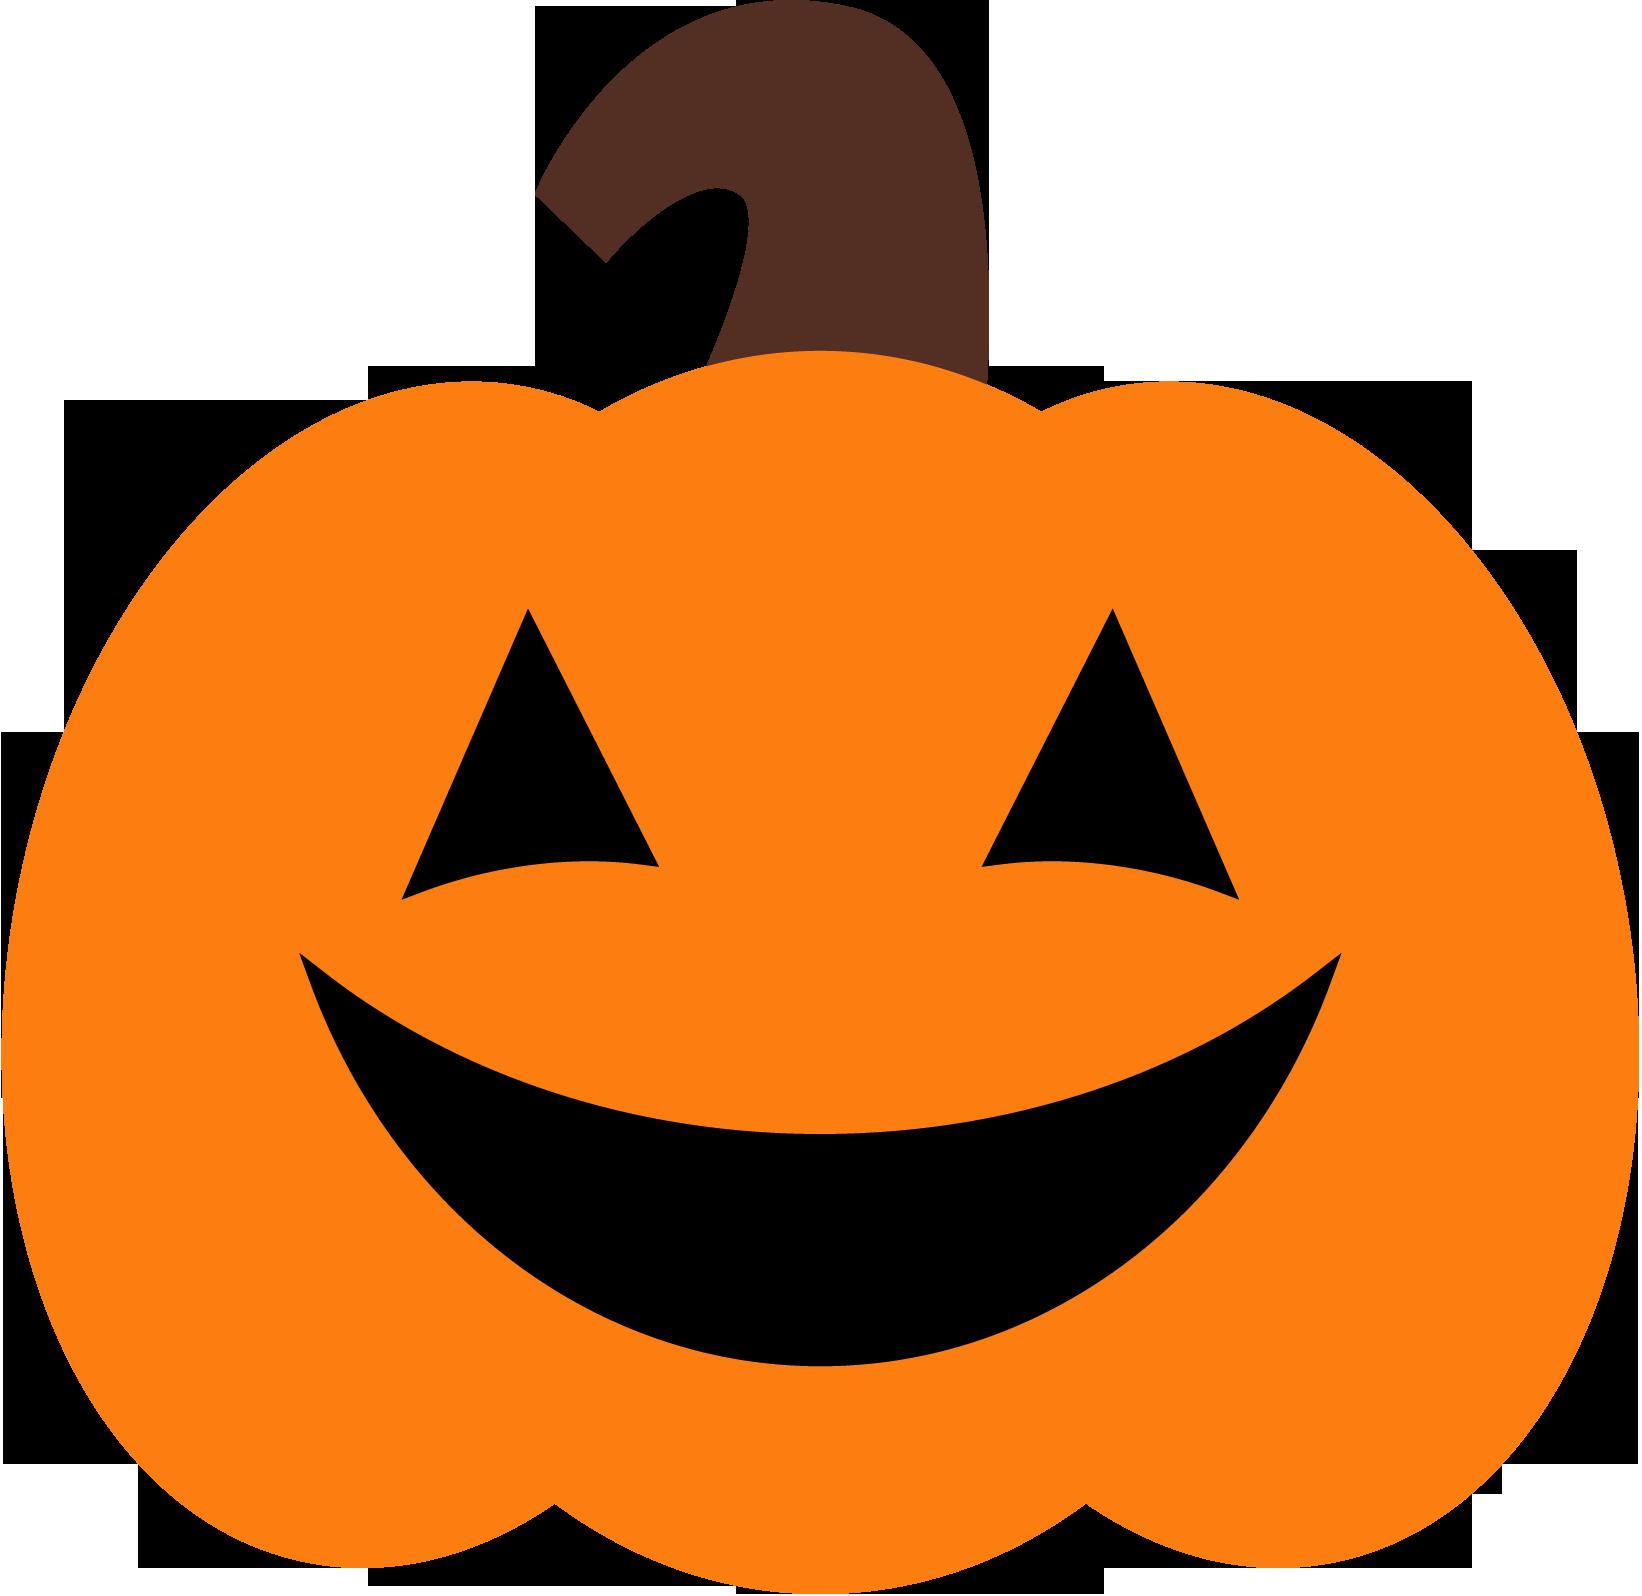 Free Pumpkin Images Free, Download Free Clip Art, Free Clip